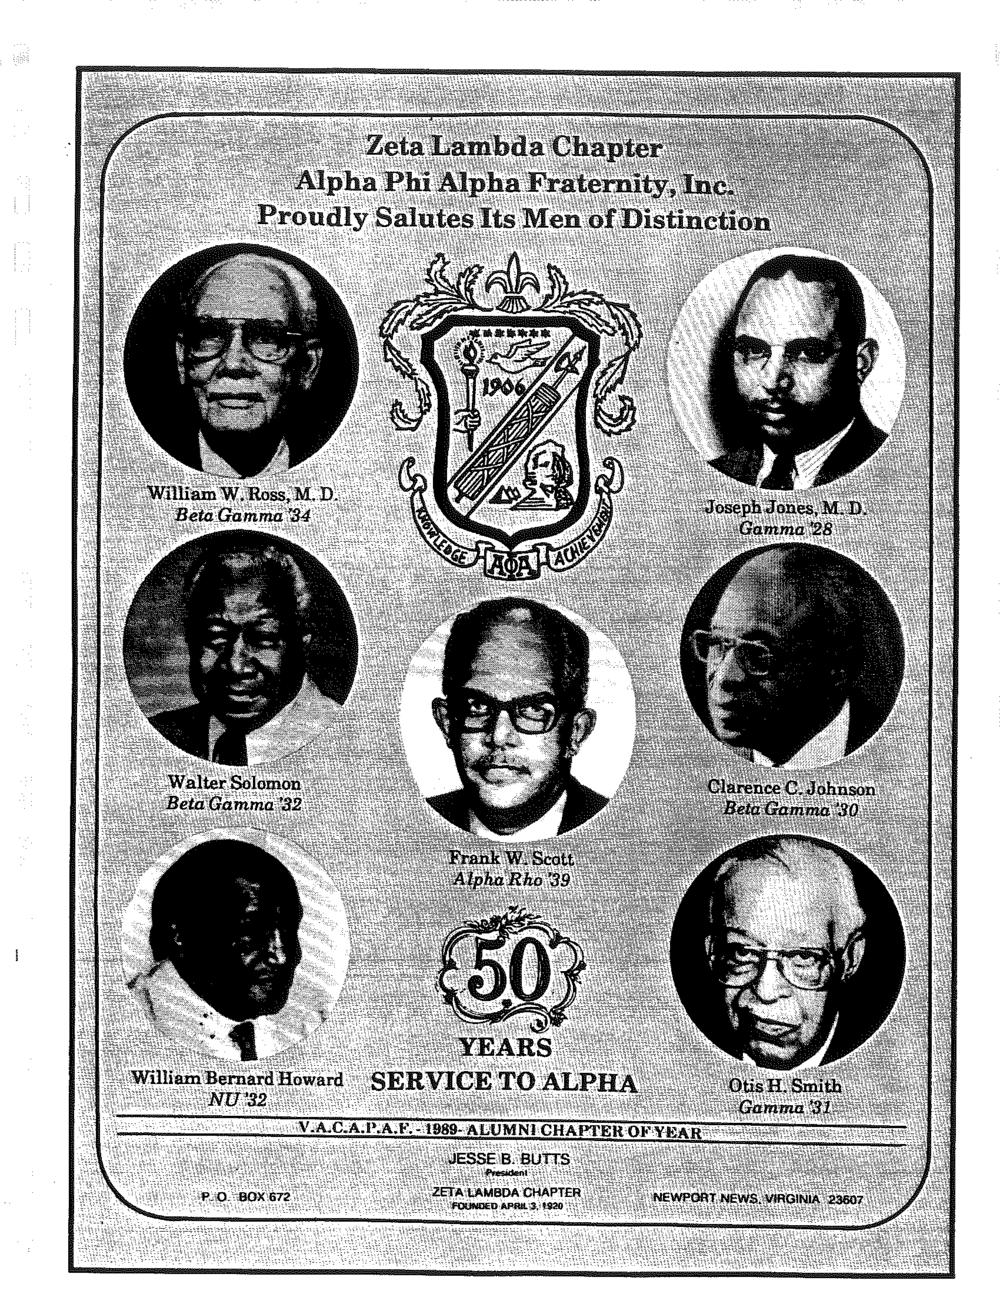 Zeta Lambda 1989 - 50 Year Brothers.png